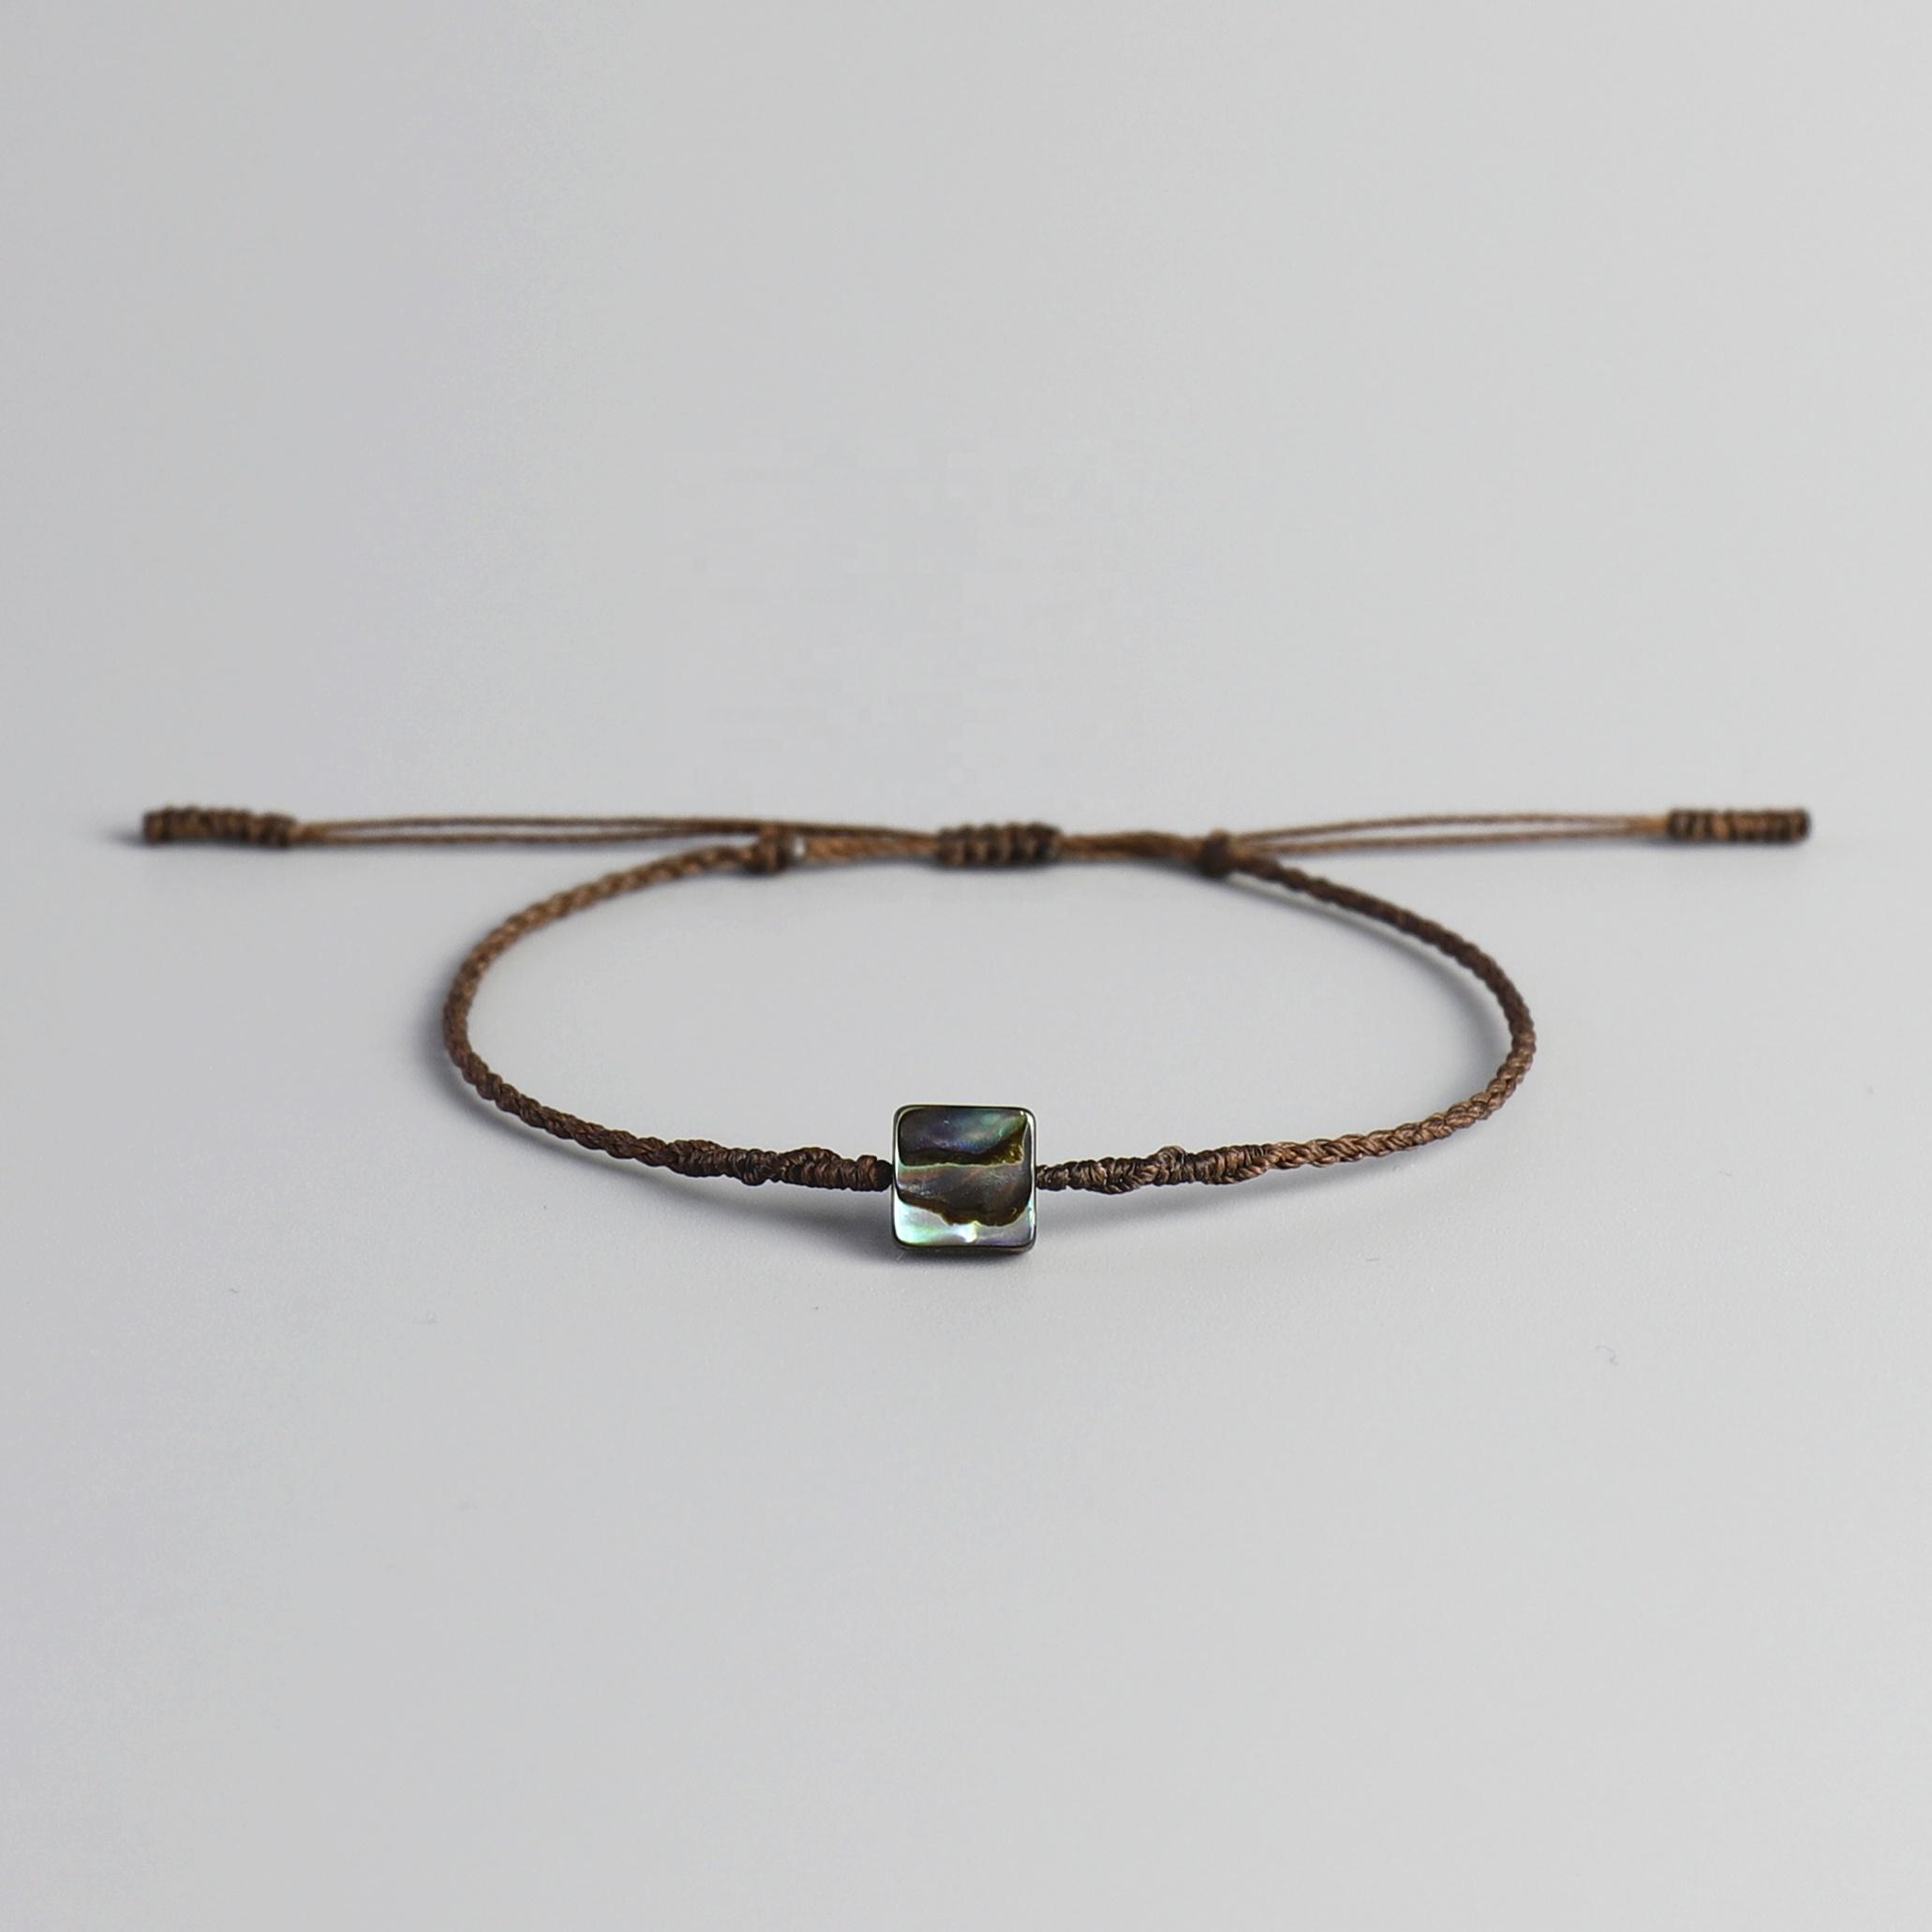 bd1242255149 Hecho a mano Natural Abalone Shell impermeable hilo de cera cable mano  tejido espiral nudo cuerda